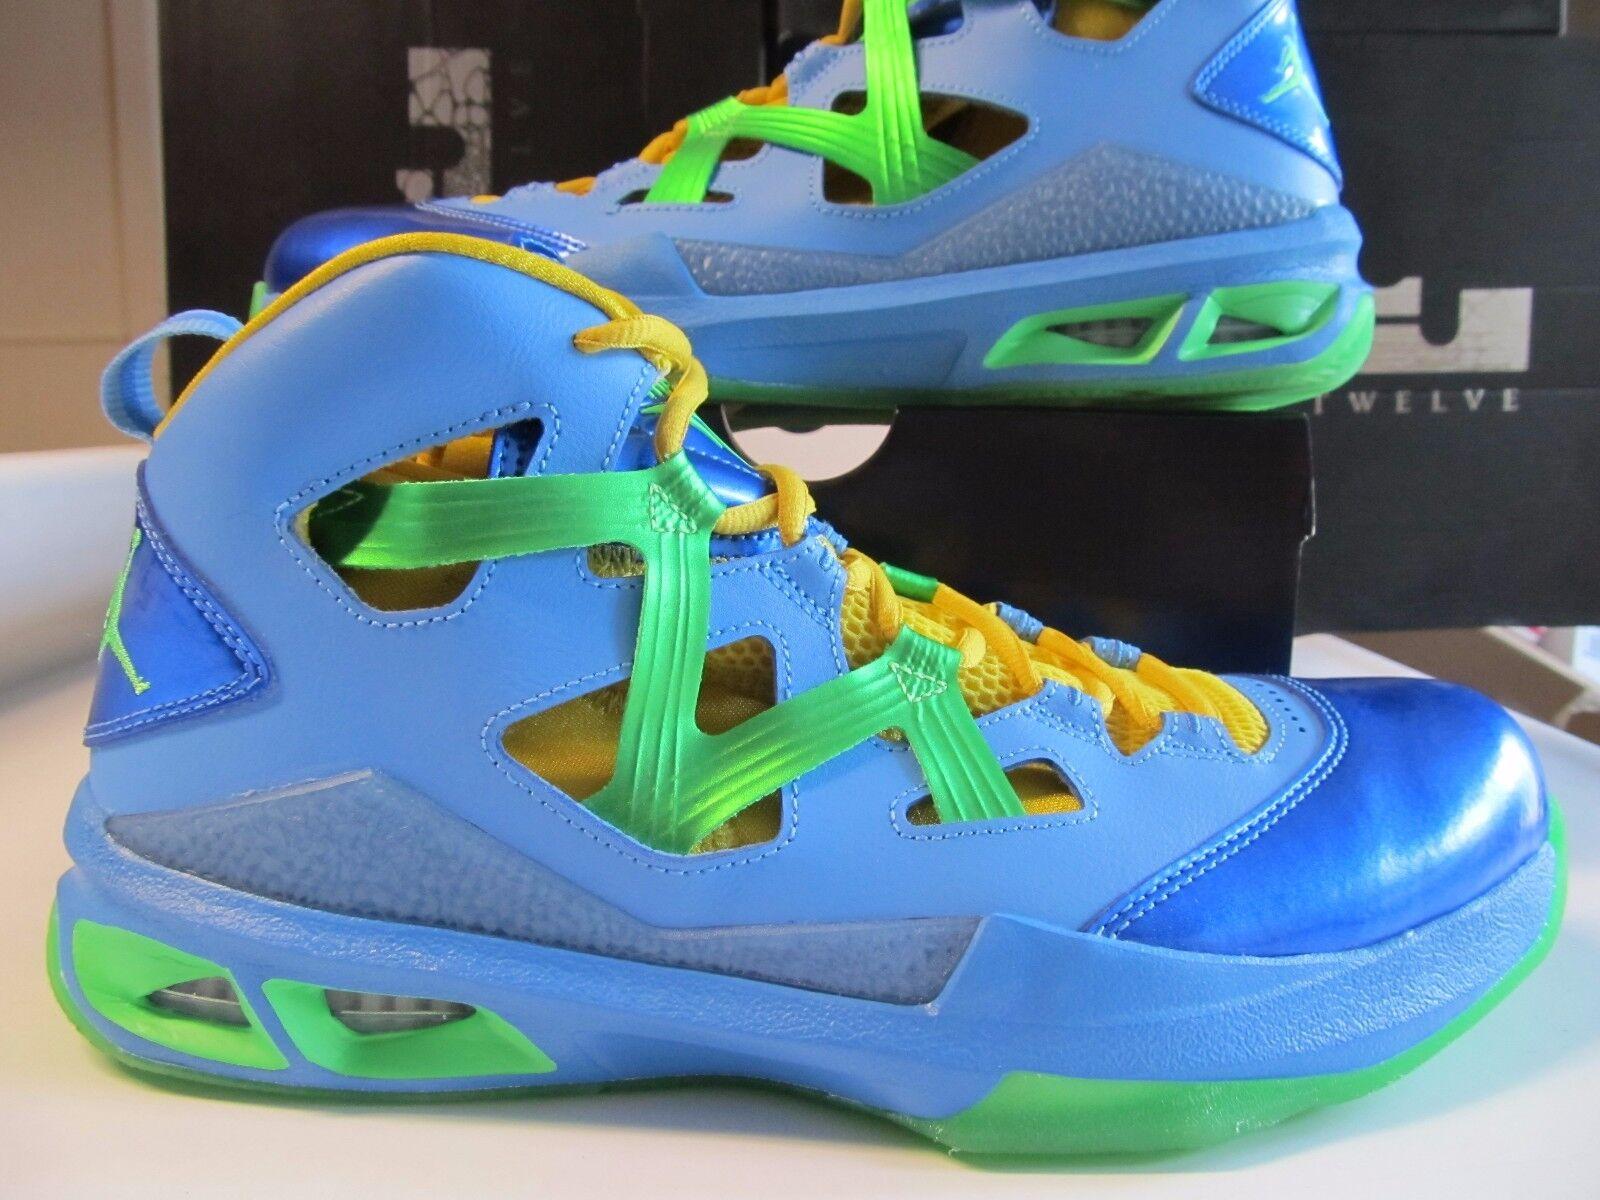 Nike Air Jordan Melo M9 Vivid Blue Poison Green Yellow 551879 415 Easter Brazil